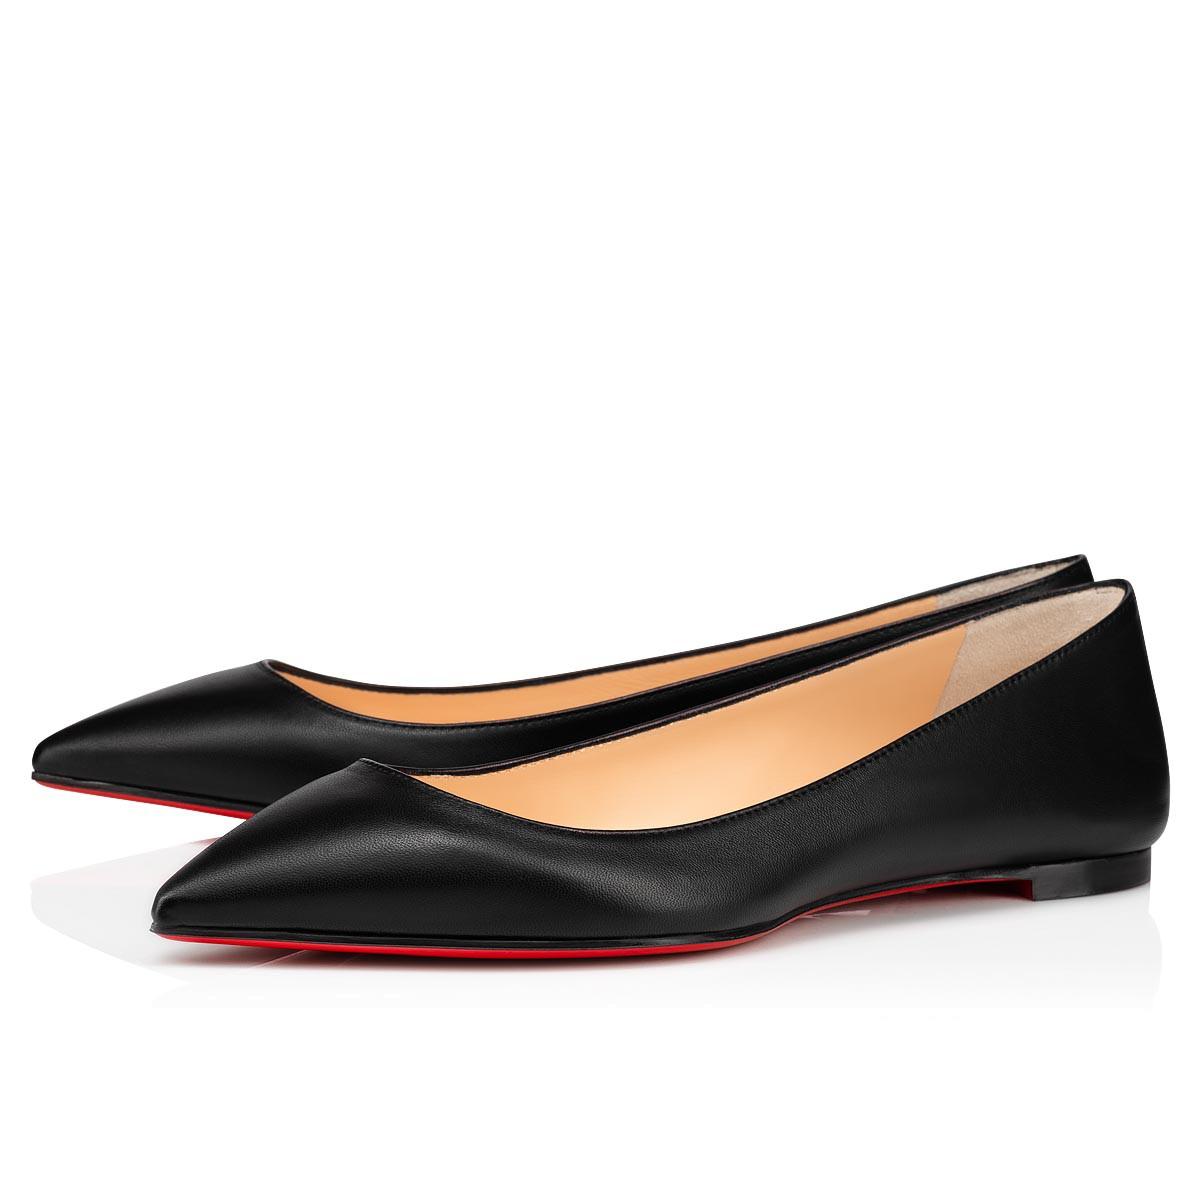 Shoes - Ballalla Flat - Christian Louboutin